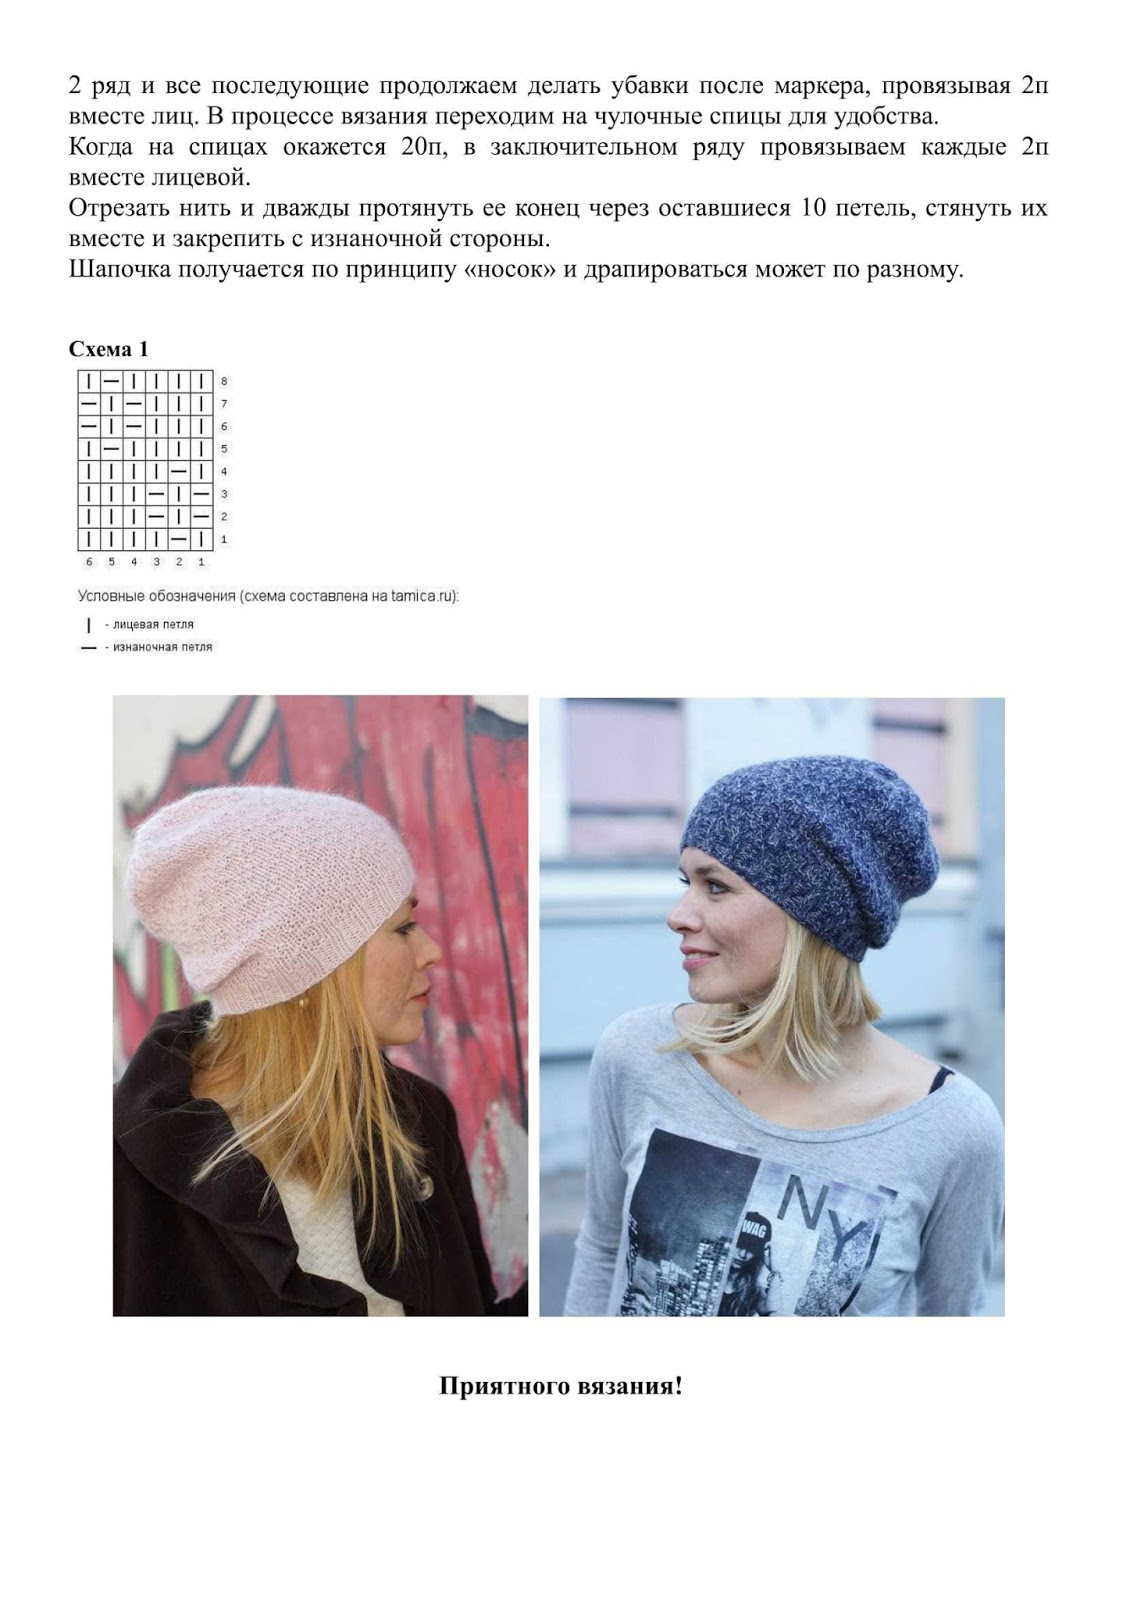 Вязаные шапки 2017-2018 со схемами спицами: шаг 2